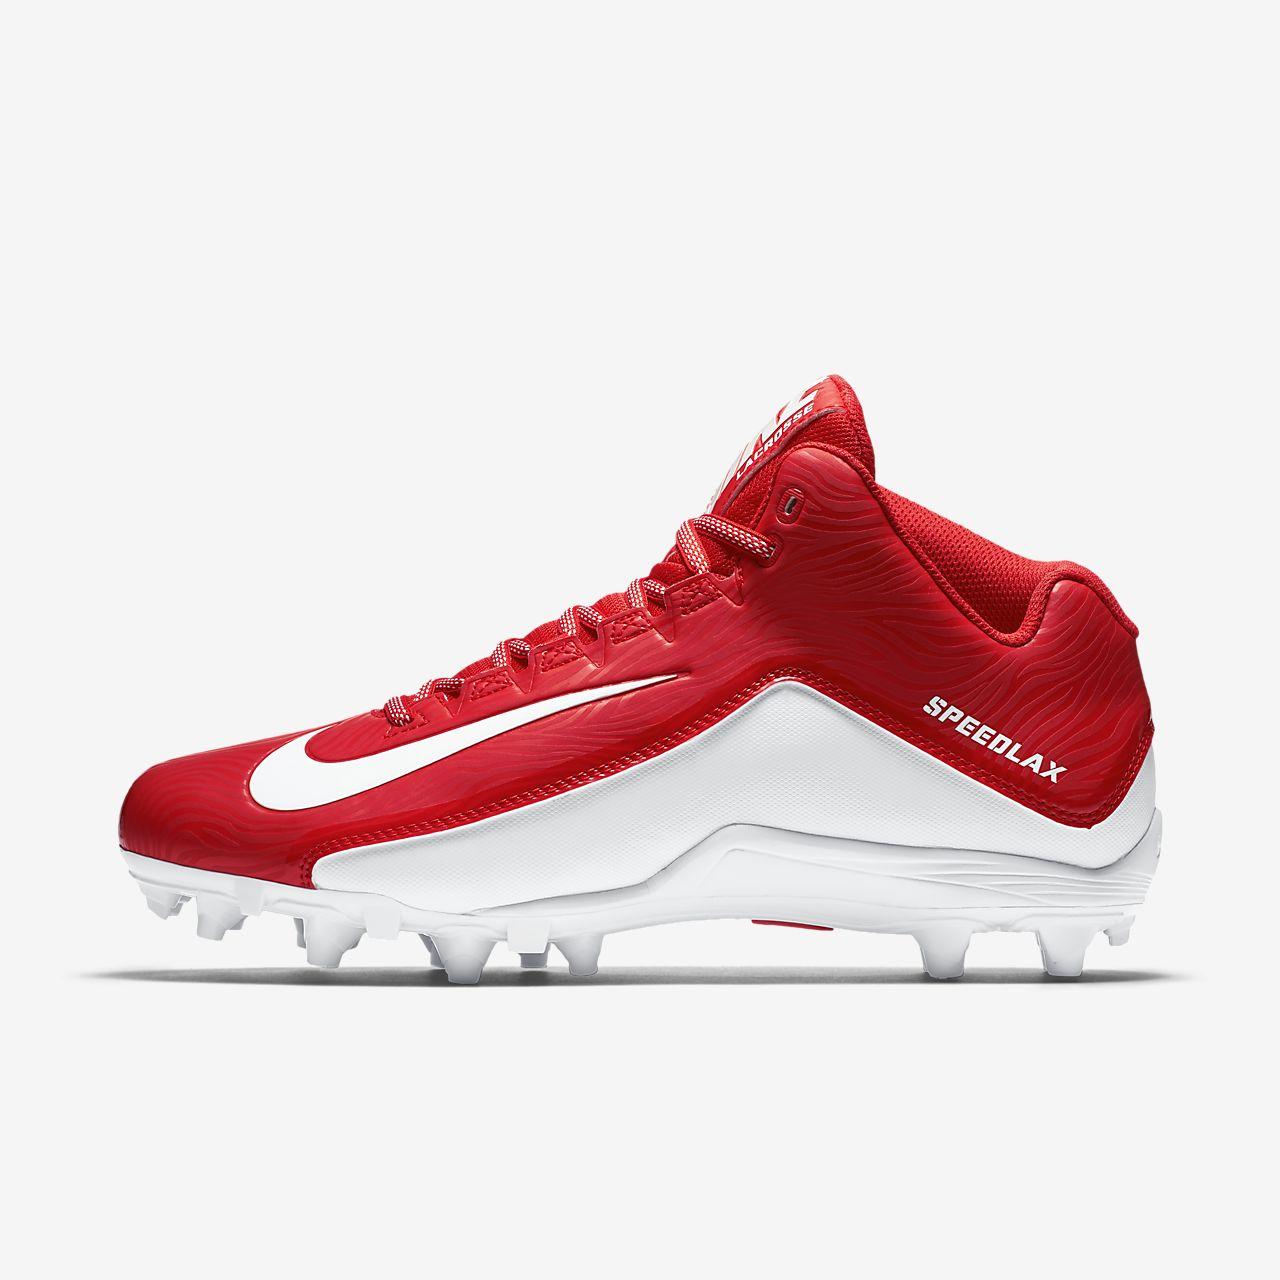 Mens Shoes Nike Speedlax 5 Challenge Red/White/White